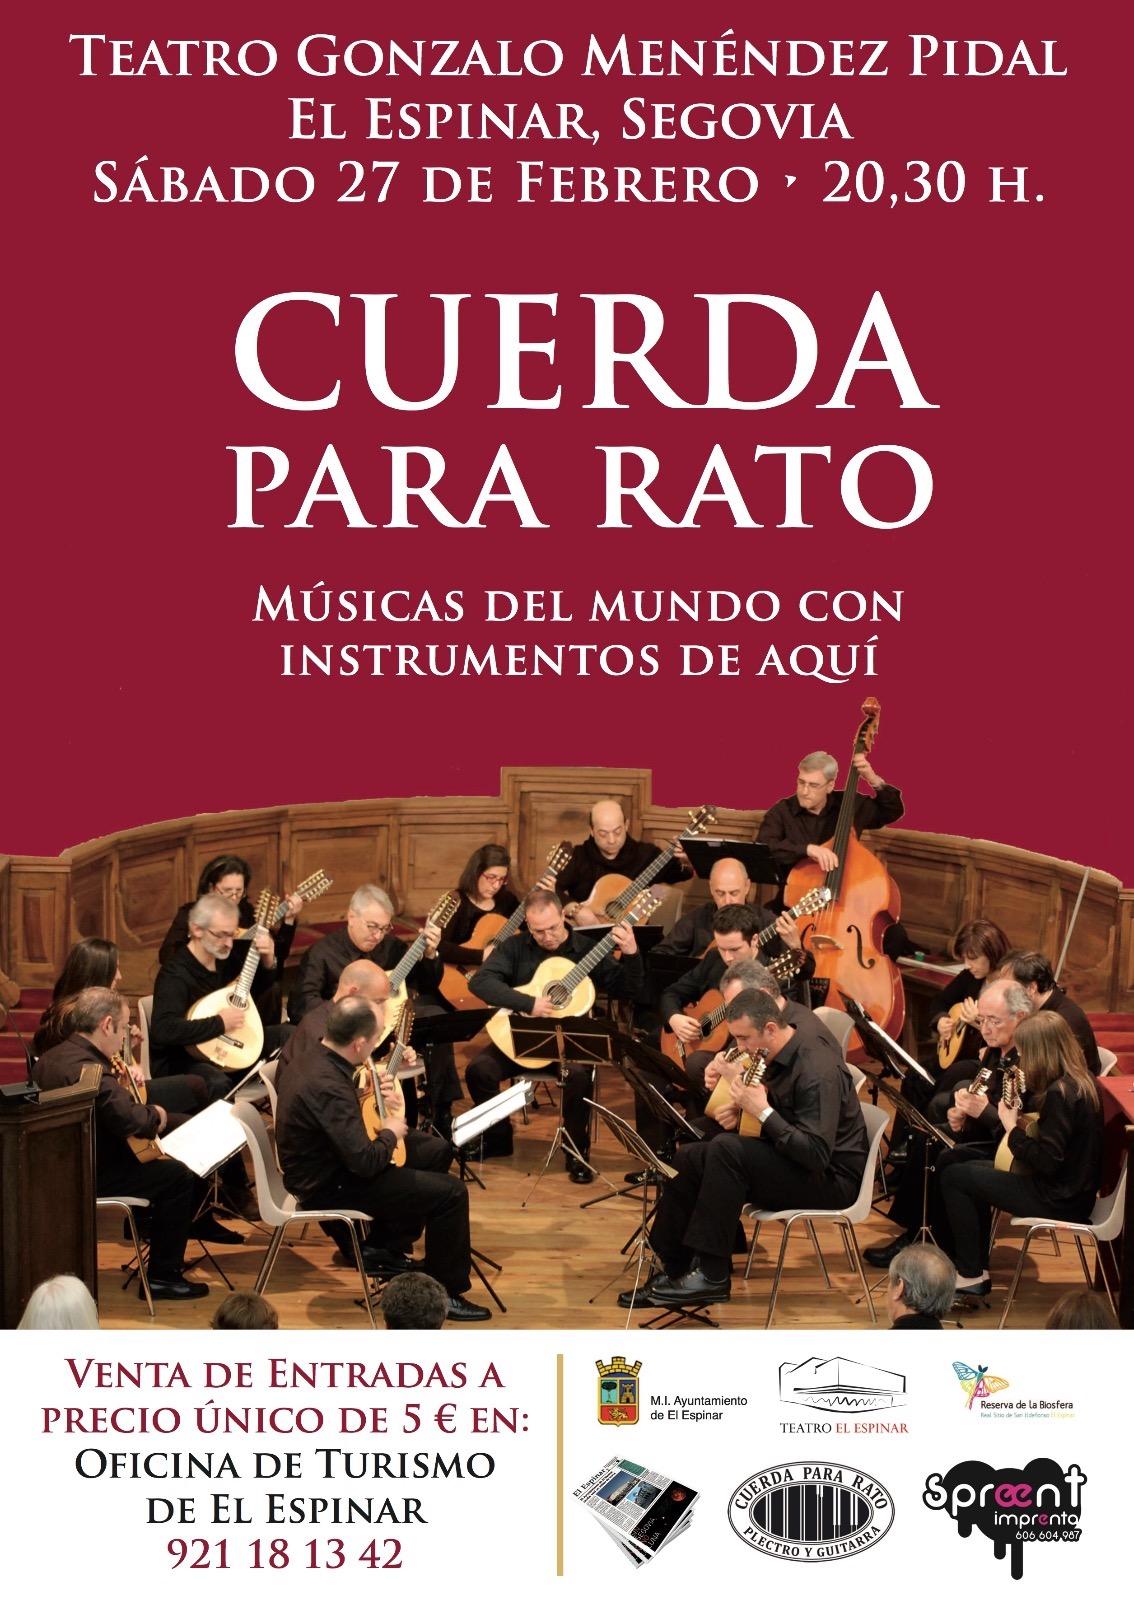 Teatro Gonzalo Menéndez Pidal